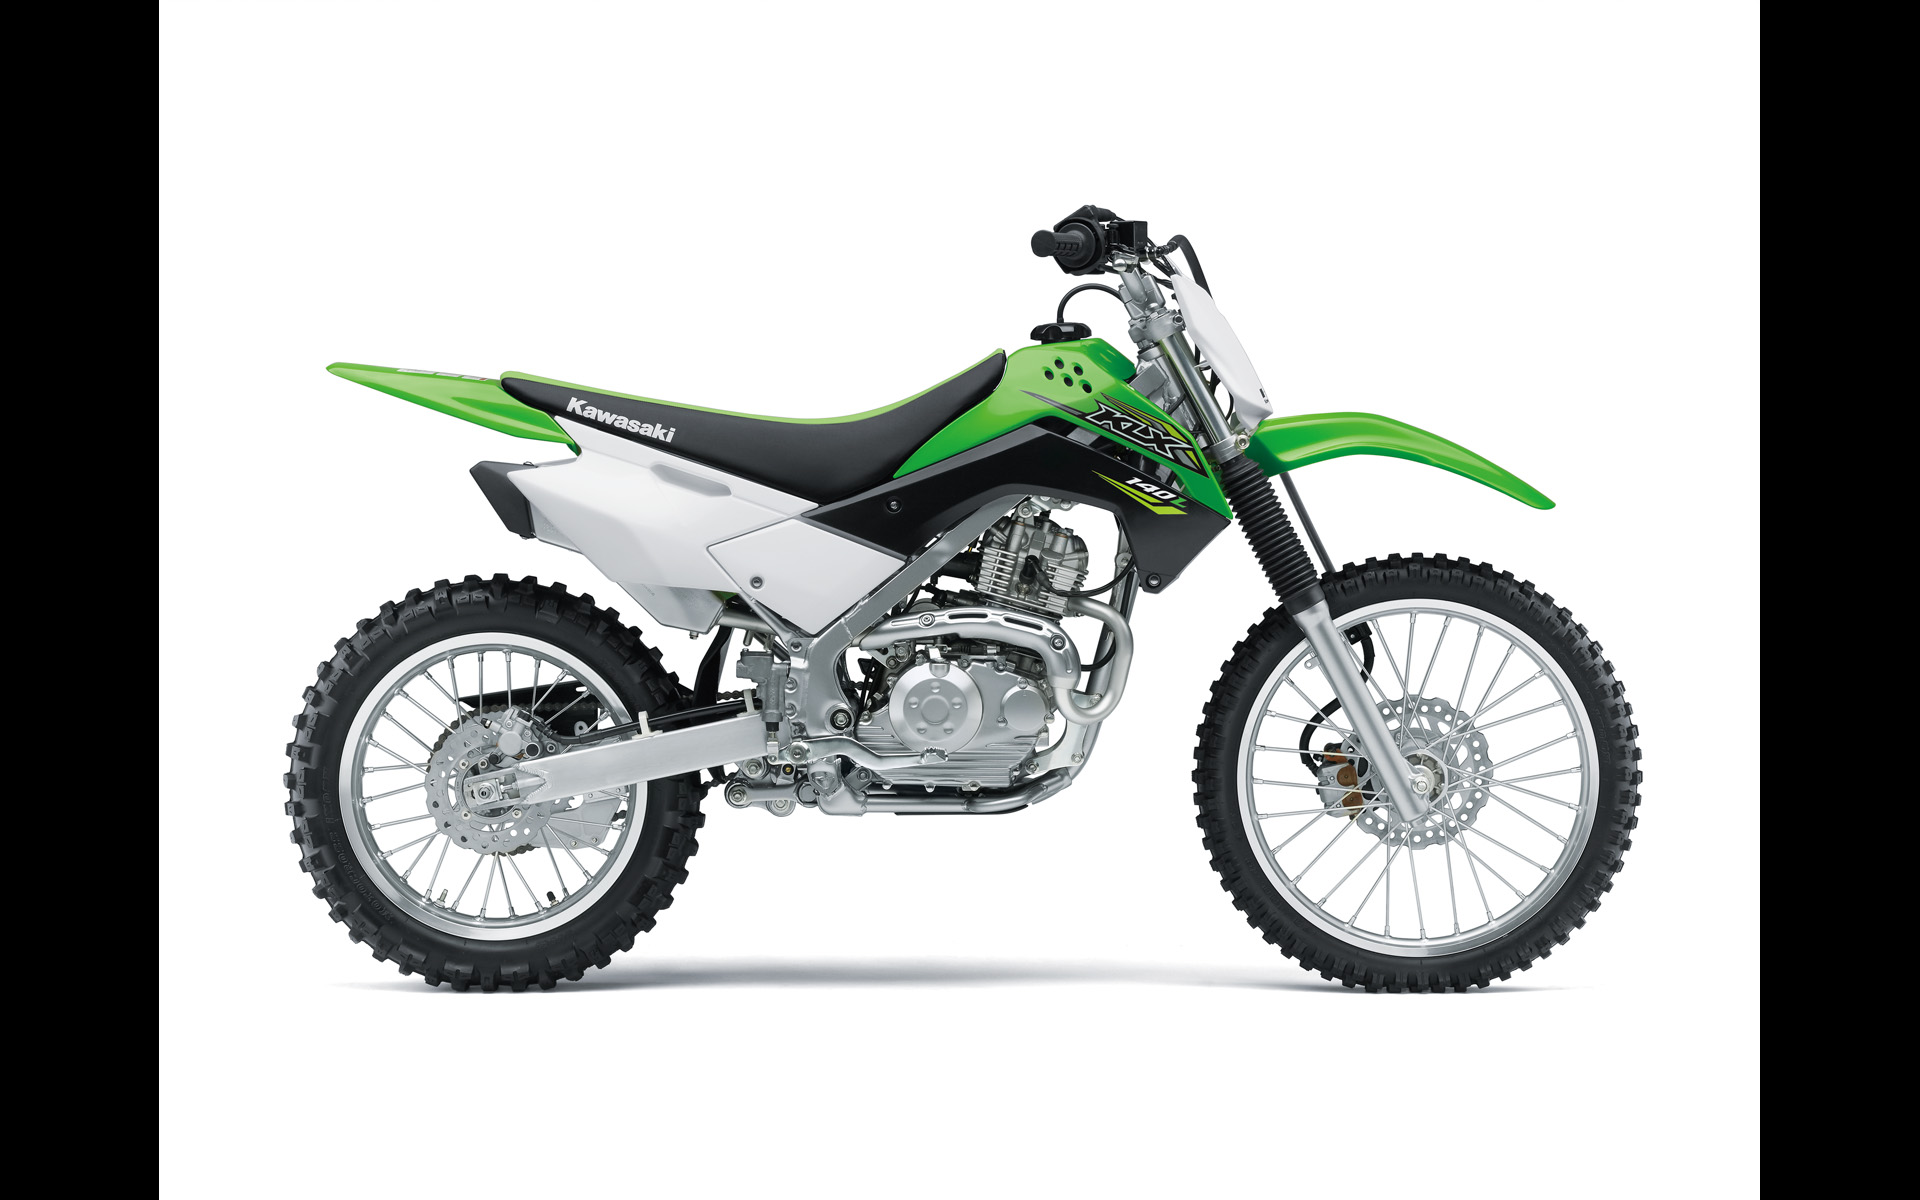 Klx 140l Motorcycle